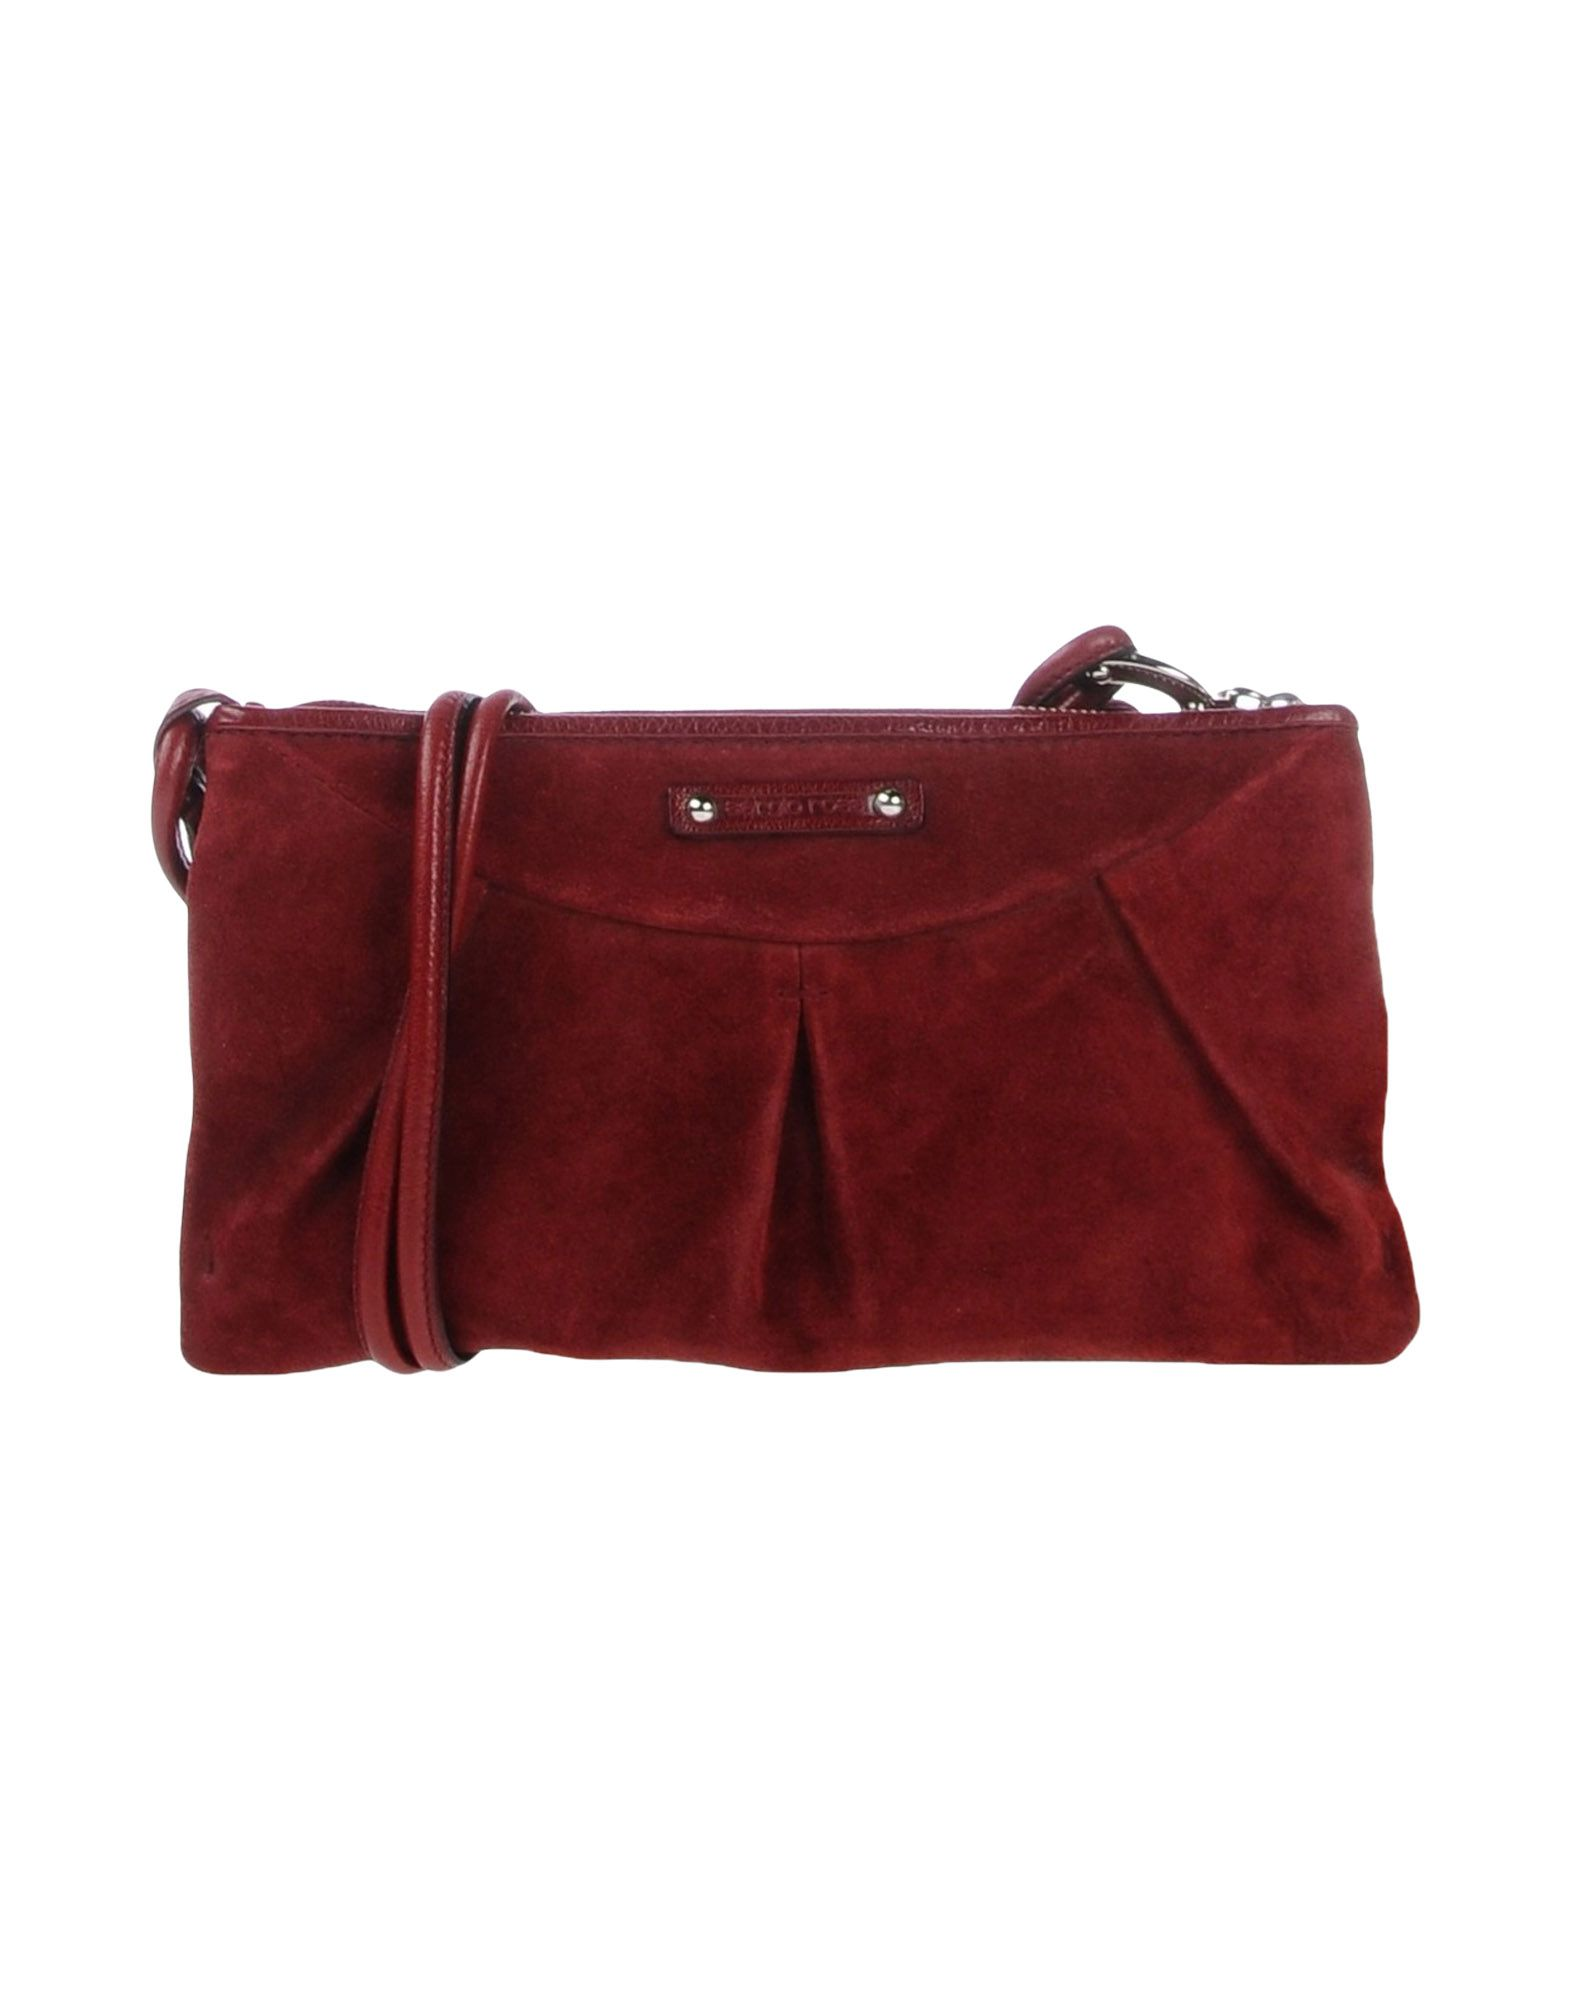 sergio rossi female sergio rossi handbags